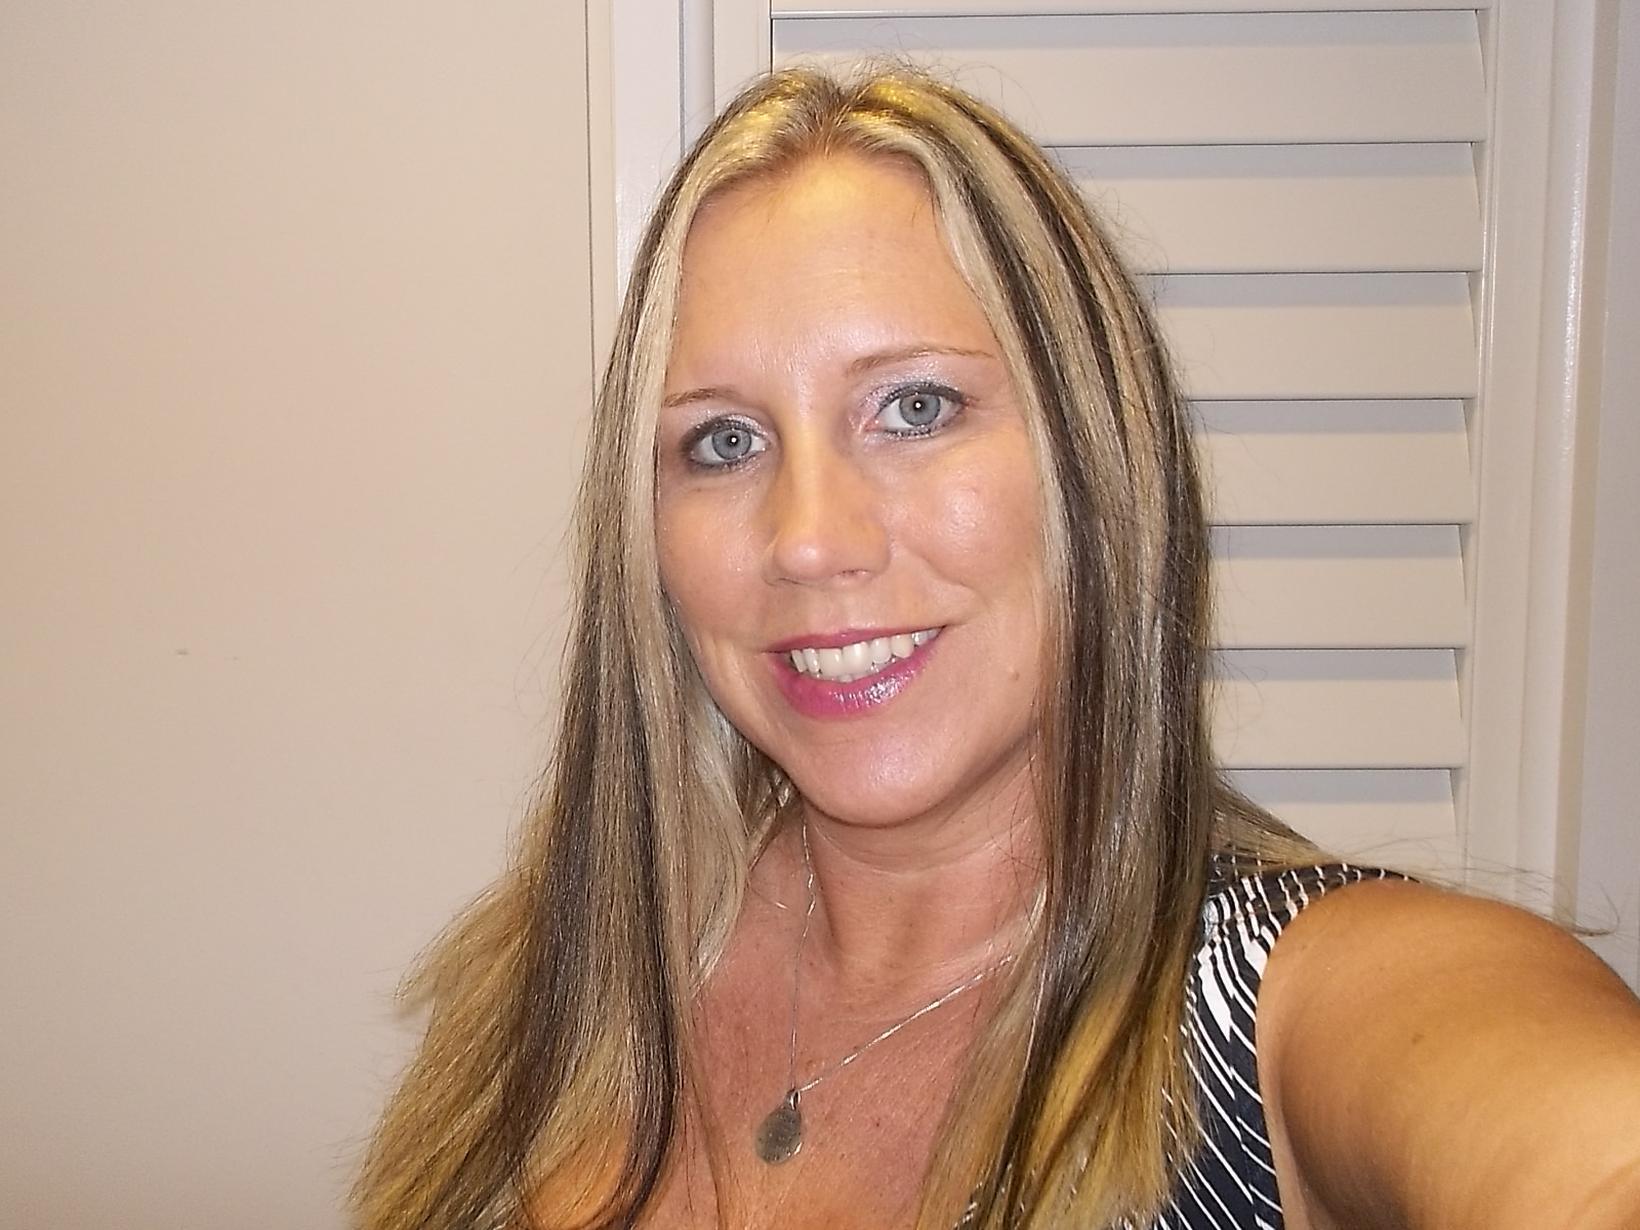 Kendra from Huntsville, Alabama, United States